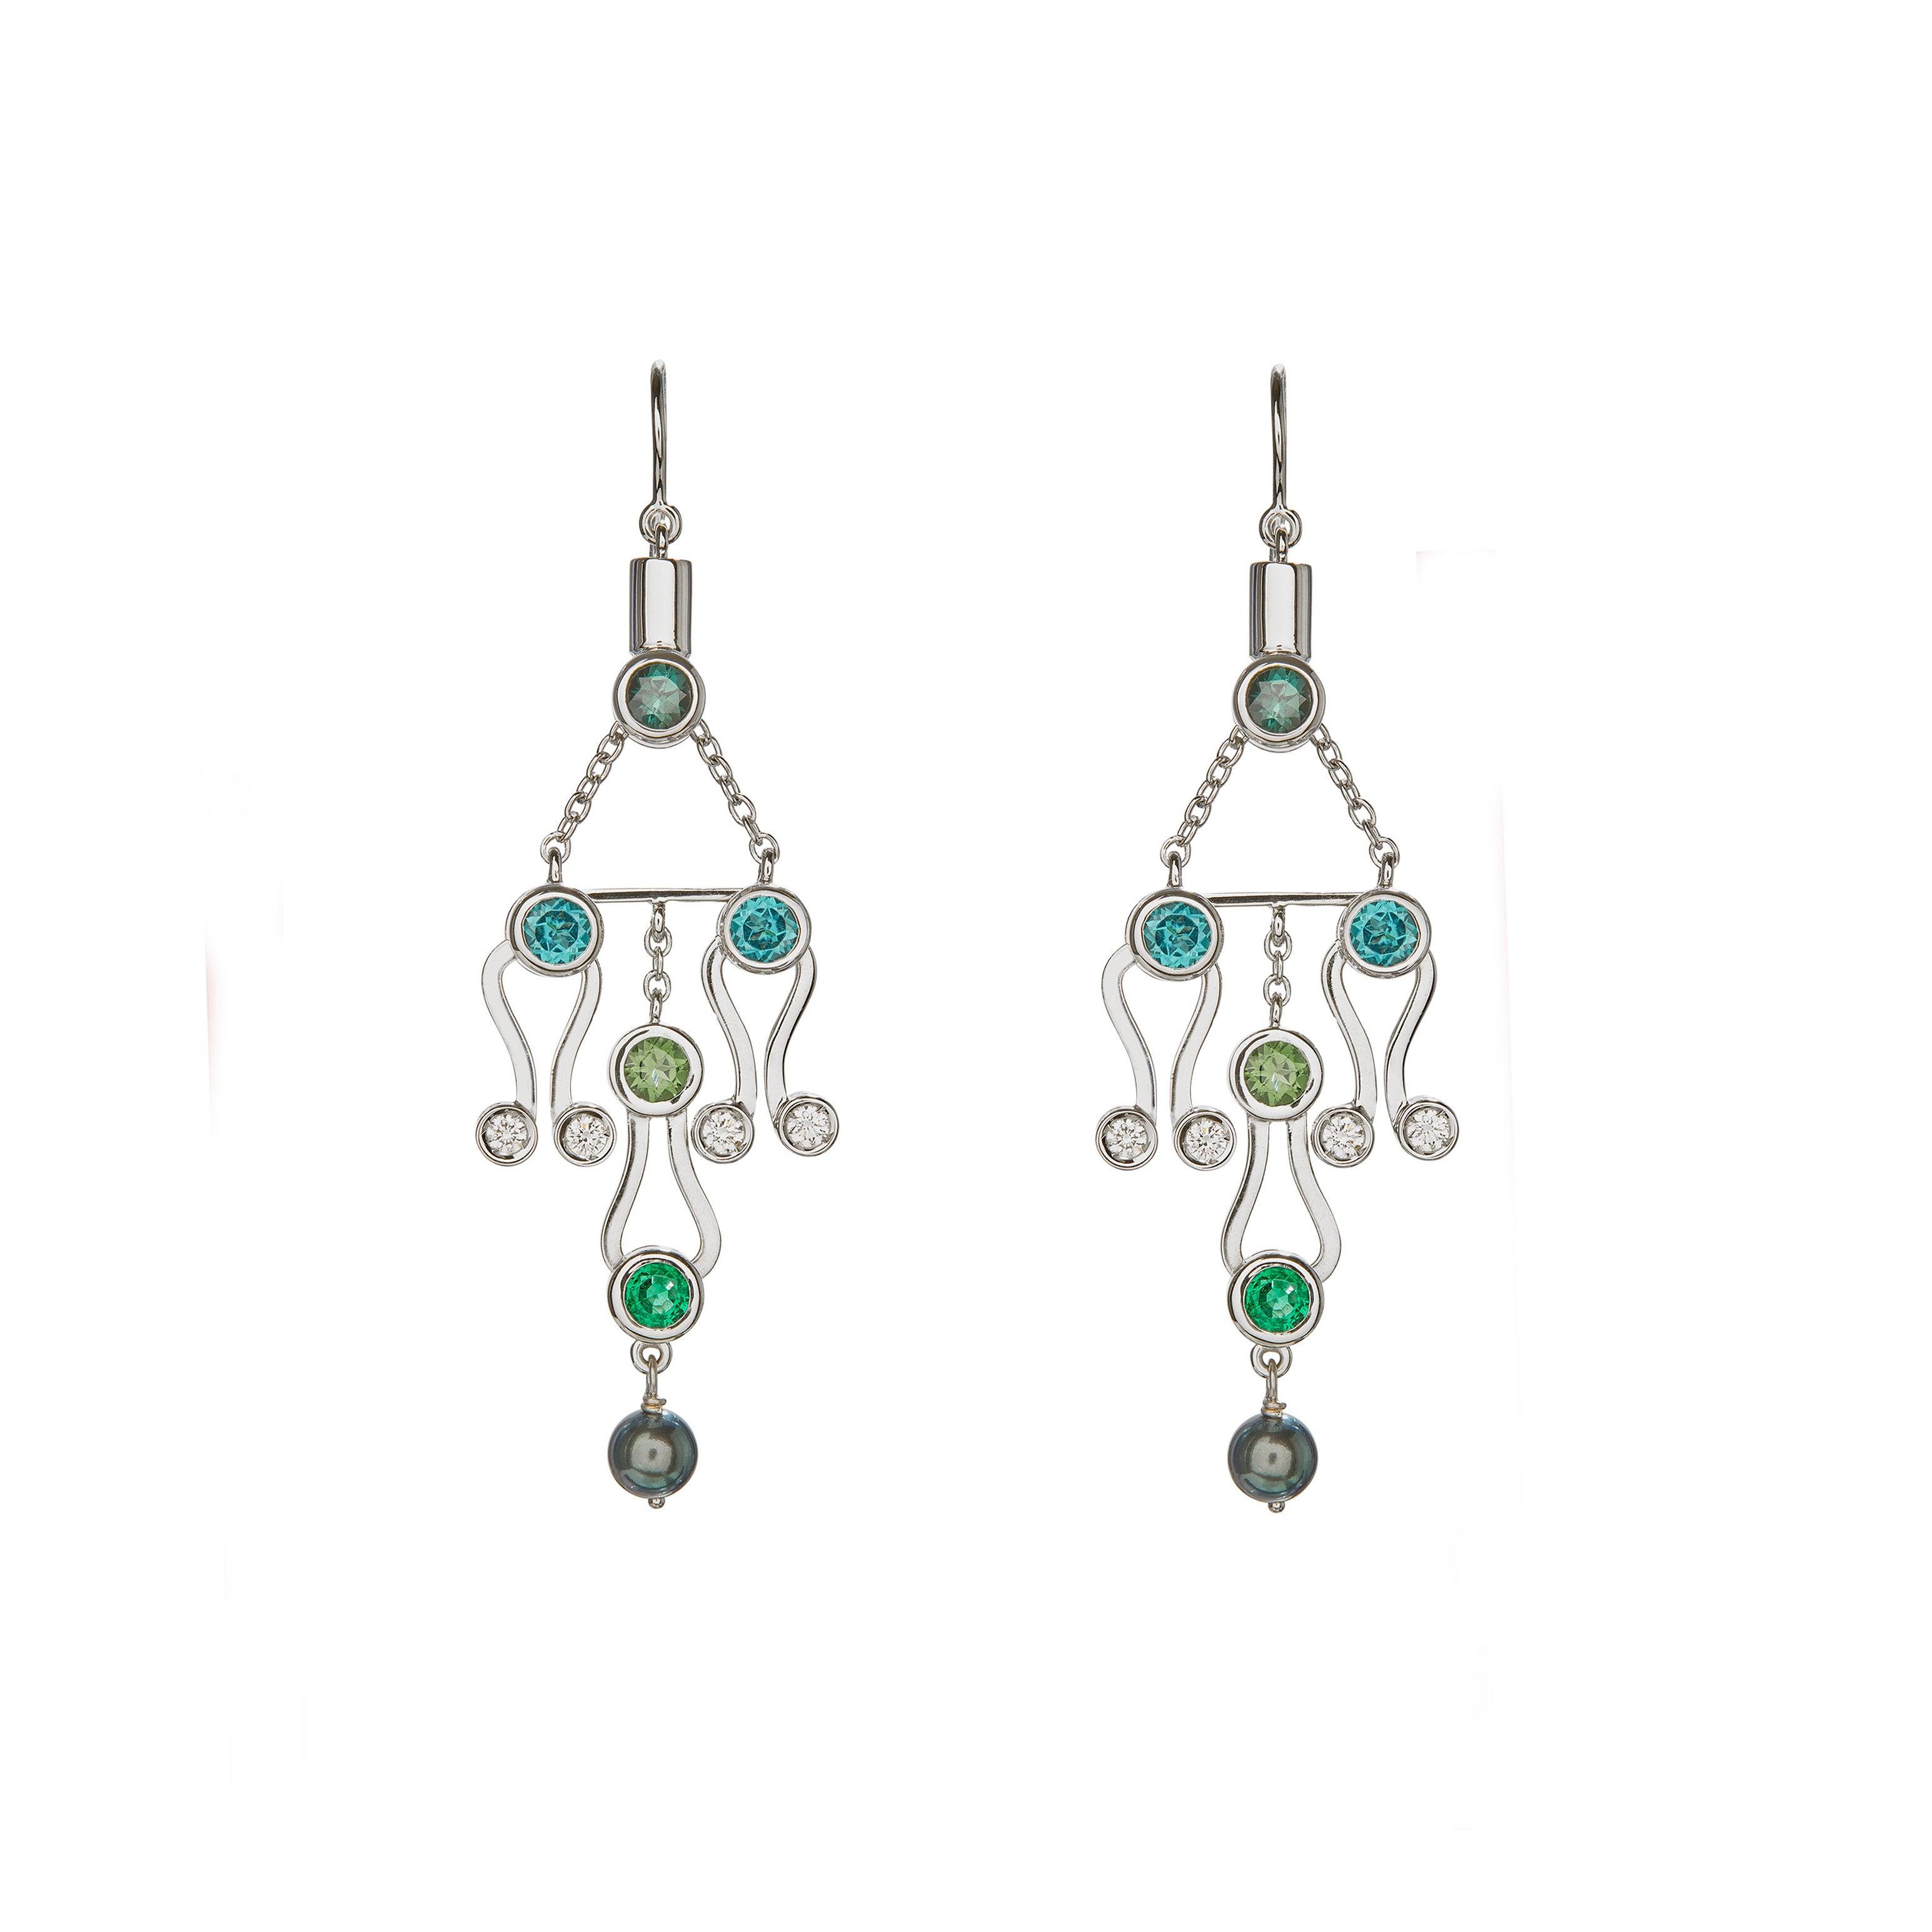 Nathalie Jean 0.2Carat Diamond Emerald Tourmaline Indicolite Pearl Gold Earrings